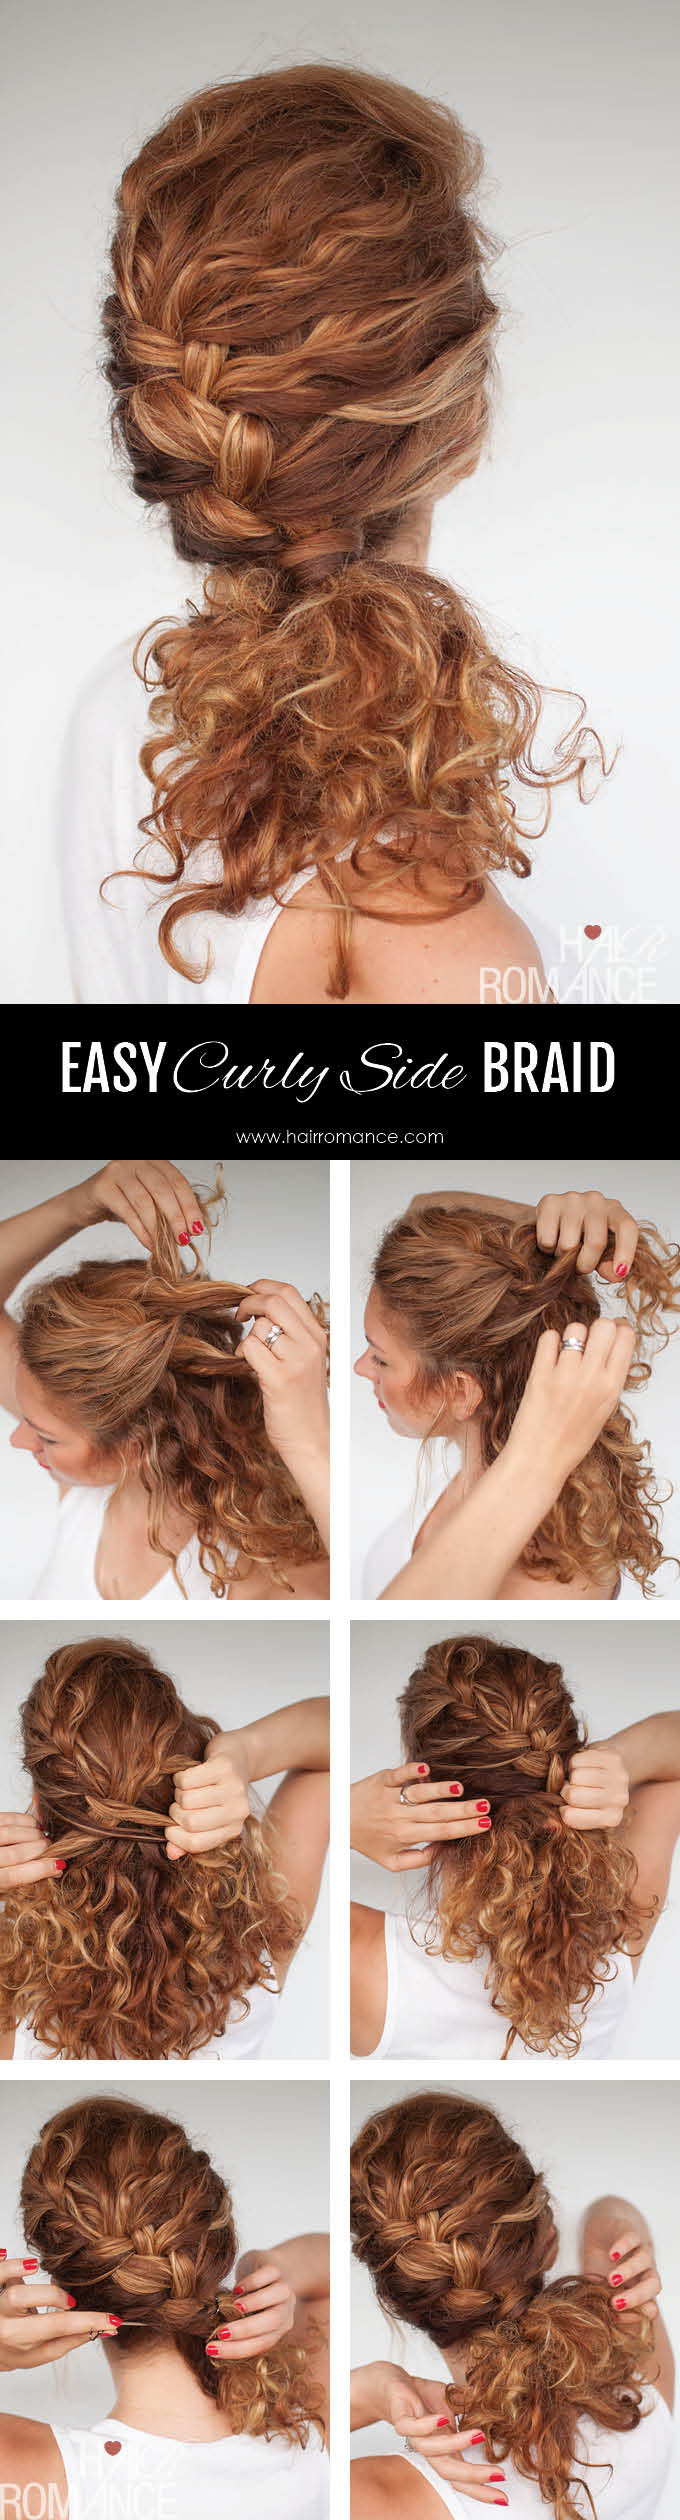 Easy Curly Wavy Hair Tutorial Everyday Hair Routine LONG HAIRSTYLES